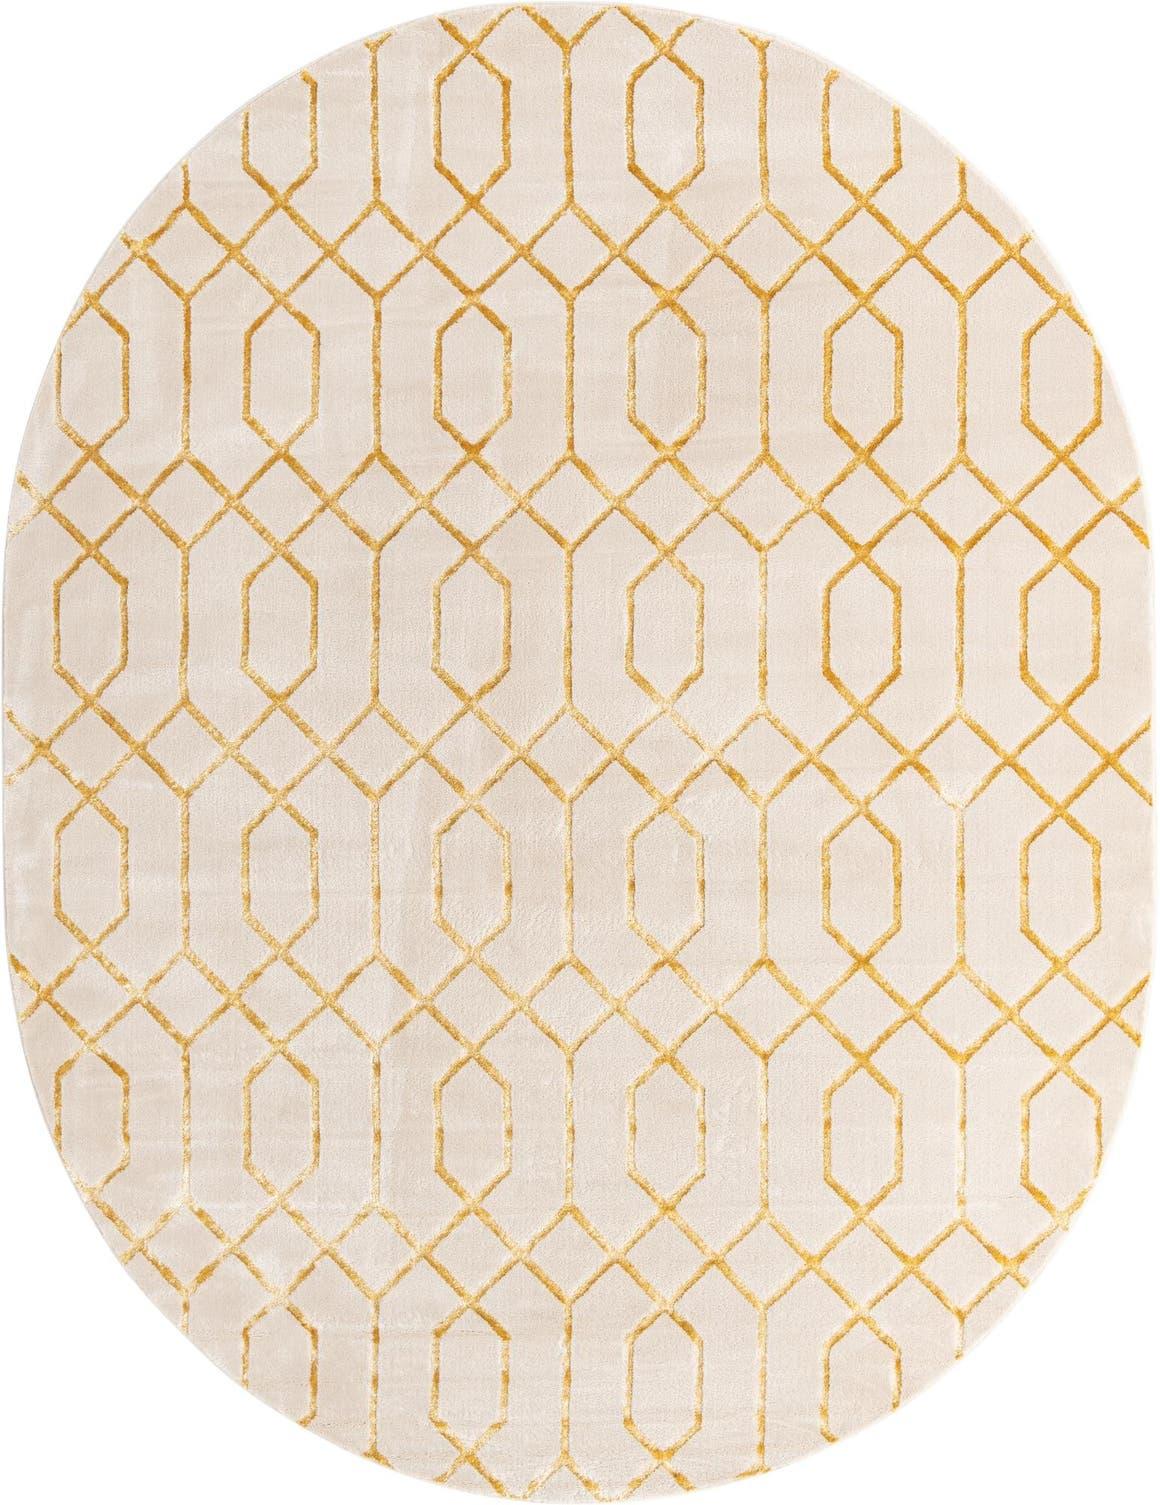 7' 10 x 10'  Marilyn Monroe™ Glam Trellis Oval Rug main image